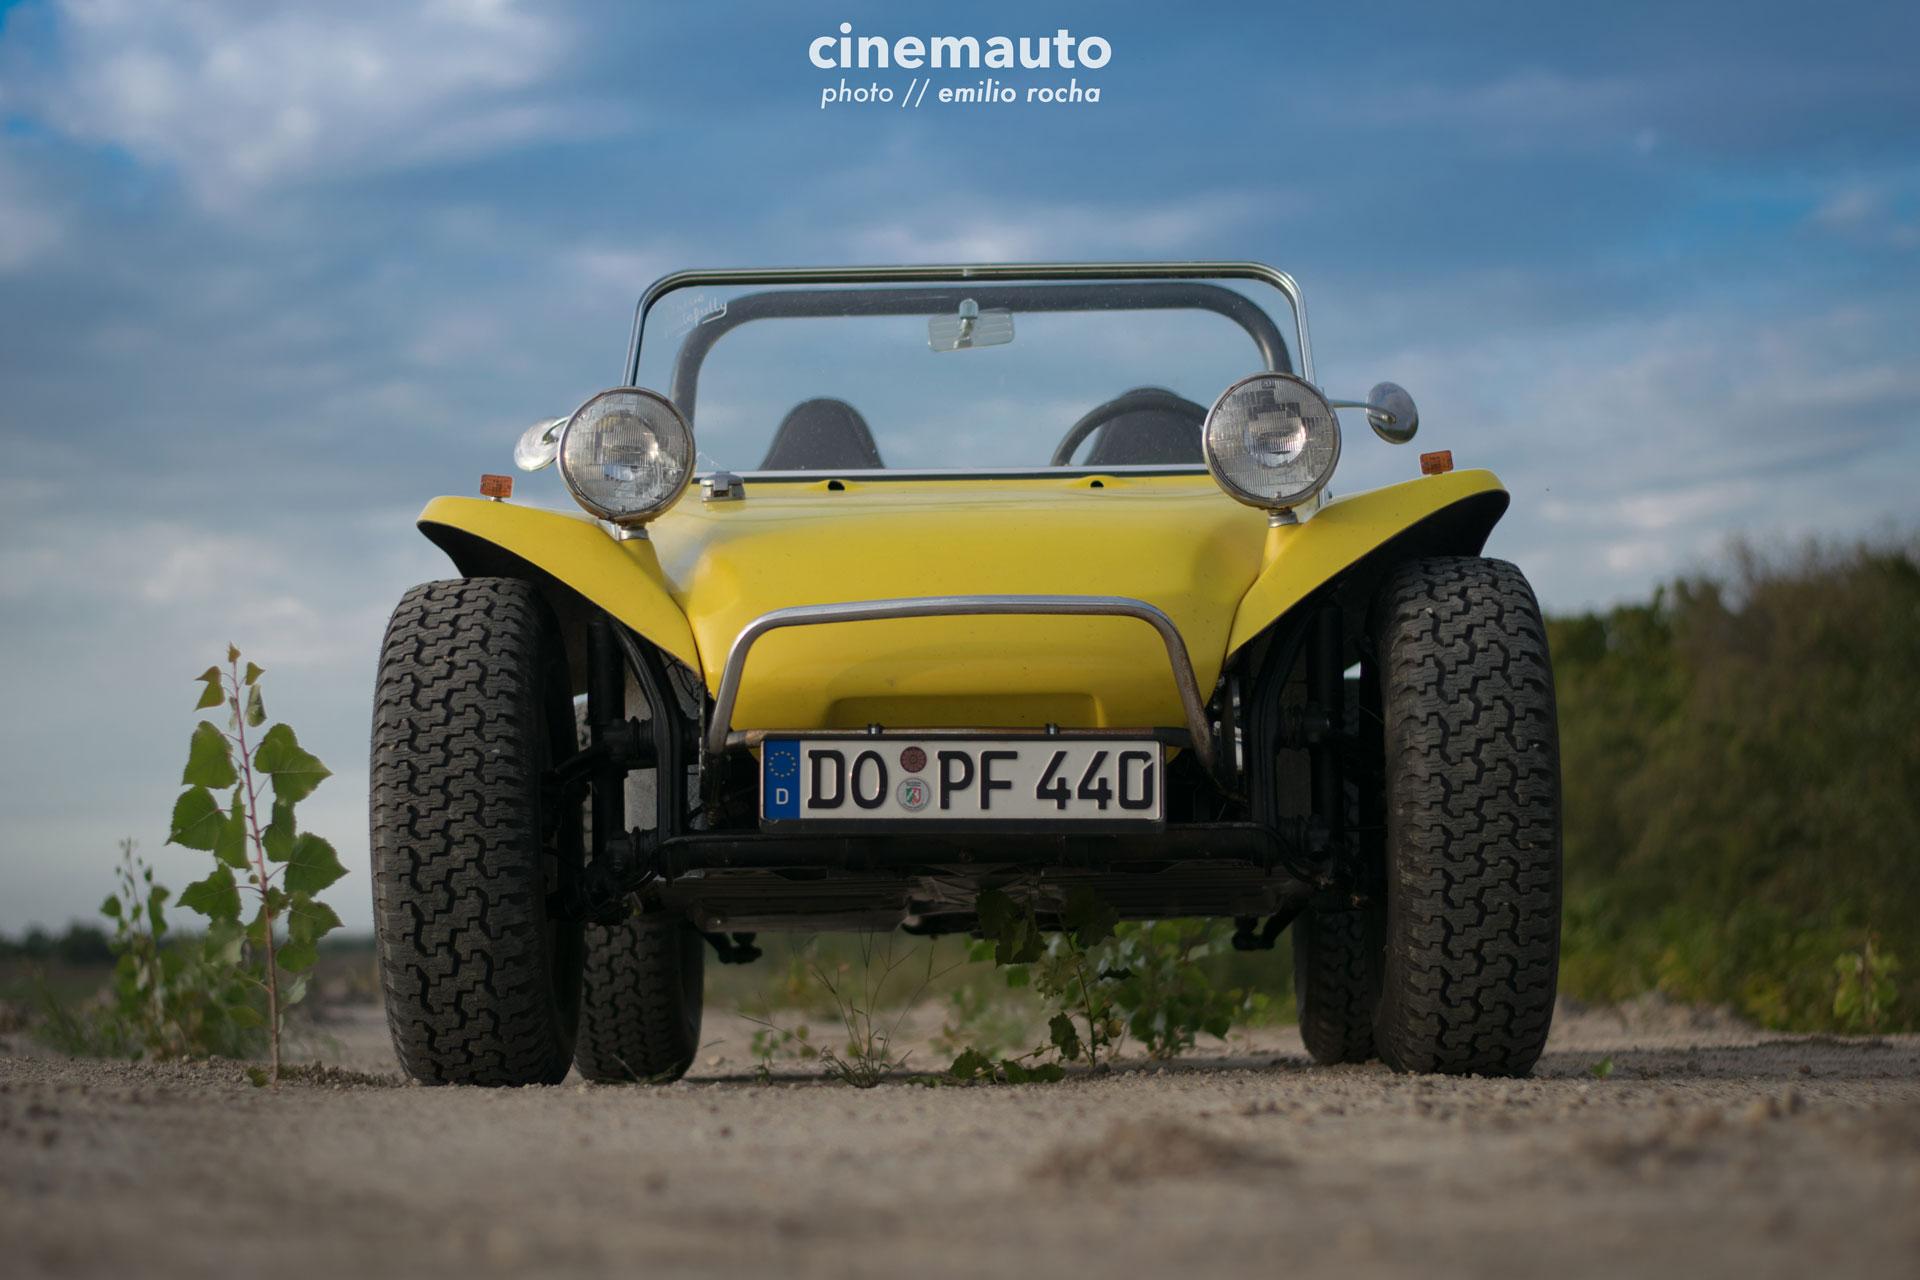 wichita-automotive-photography-cinemauto-gv8.jpg